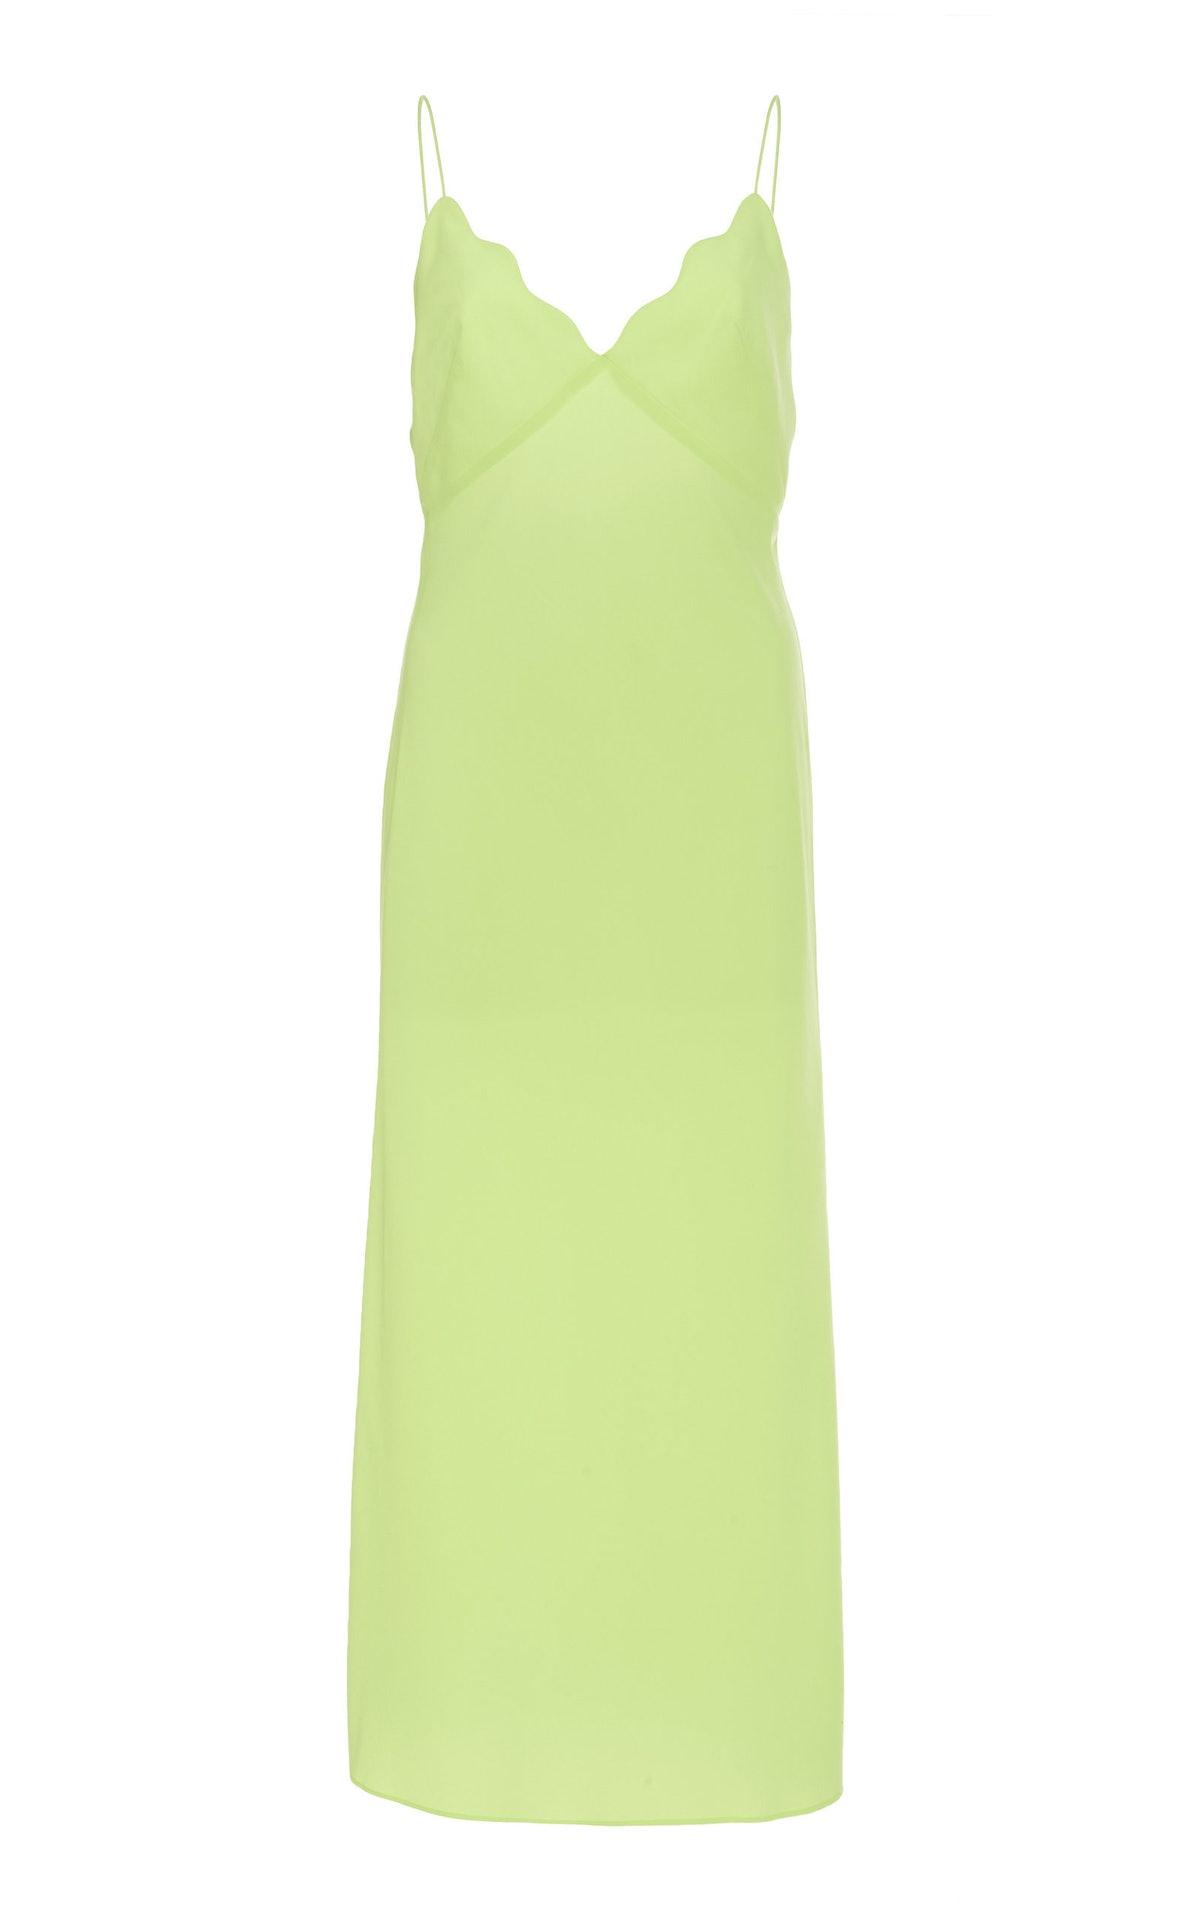 Aviel Scalloped Midi Slip Dress